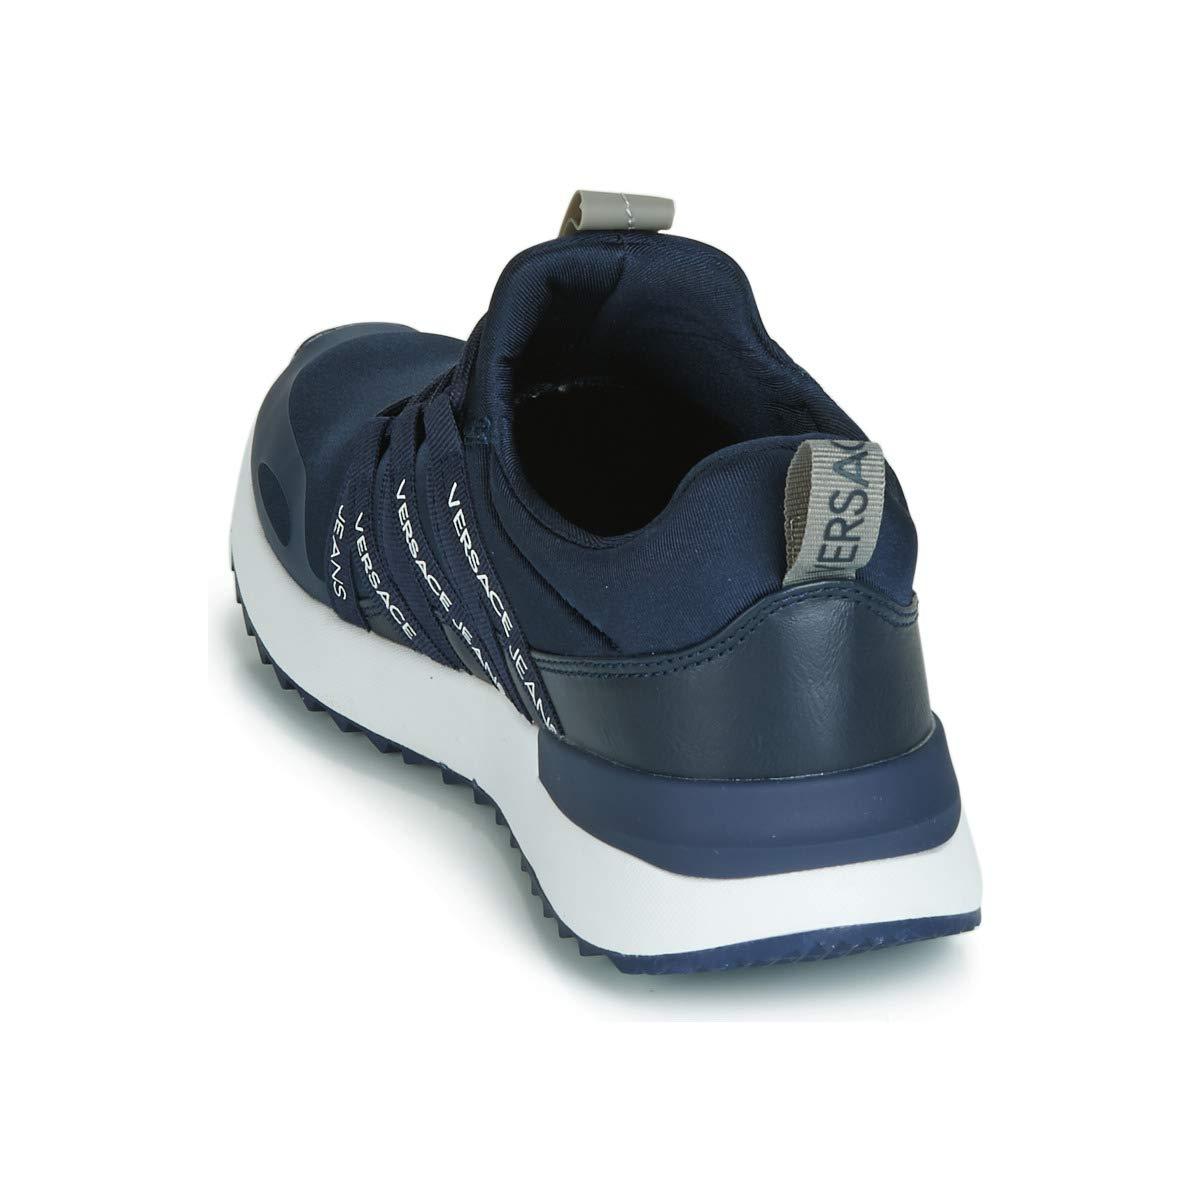 Versace Jeans EOYTBSG3 Turnschuhe Turnschuhe Turnschuhe Herren Marine Turnschuhe Low da4c08